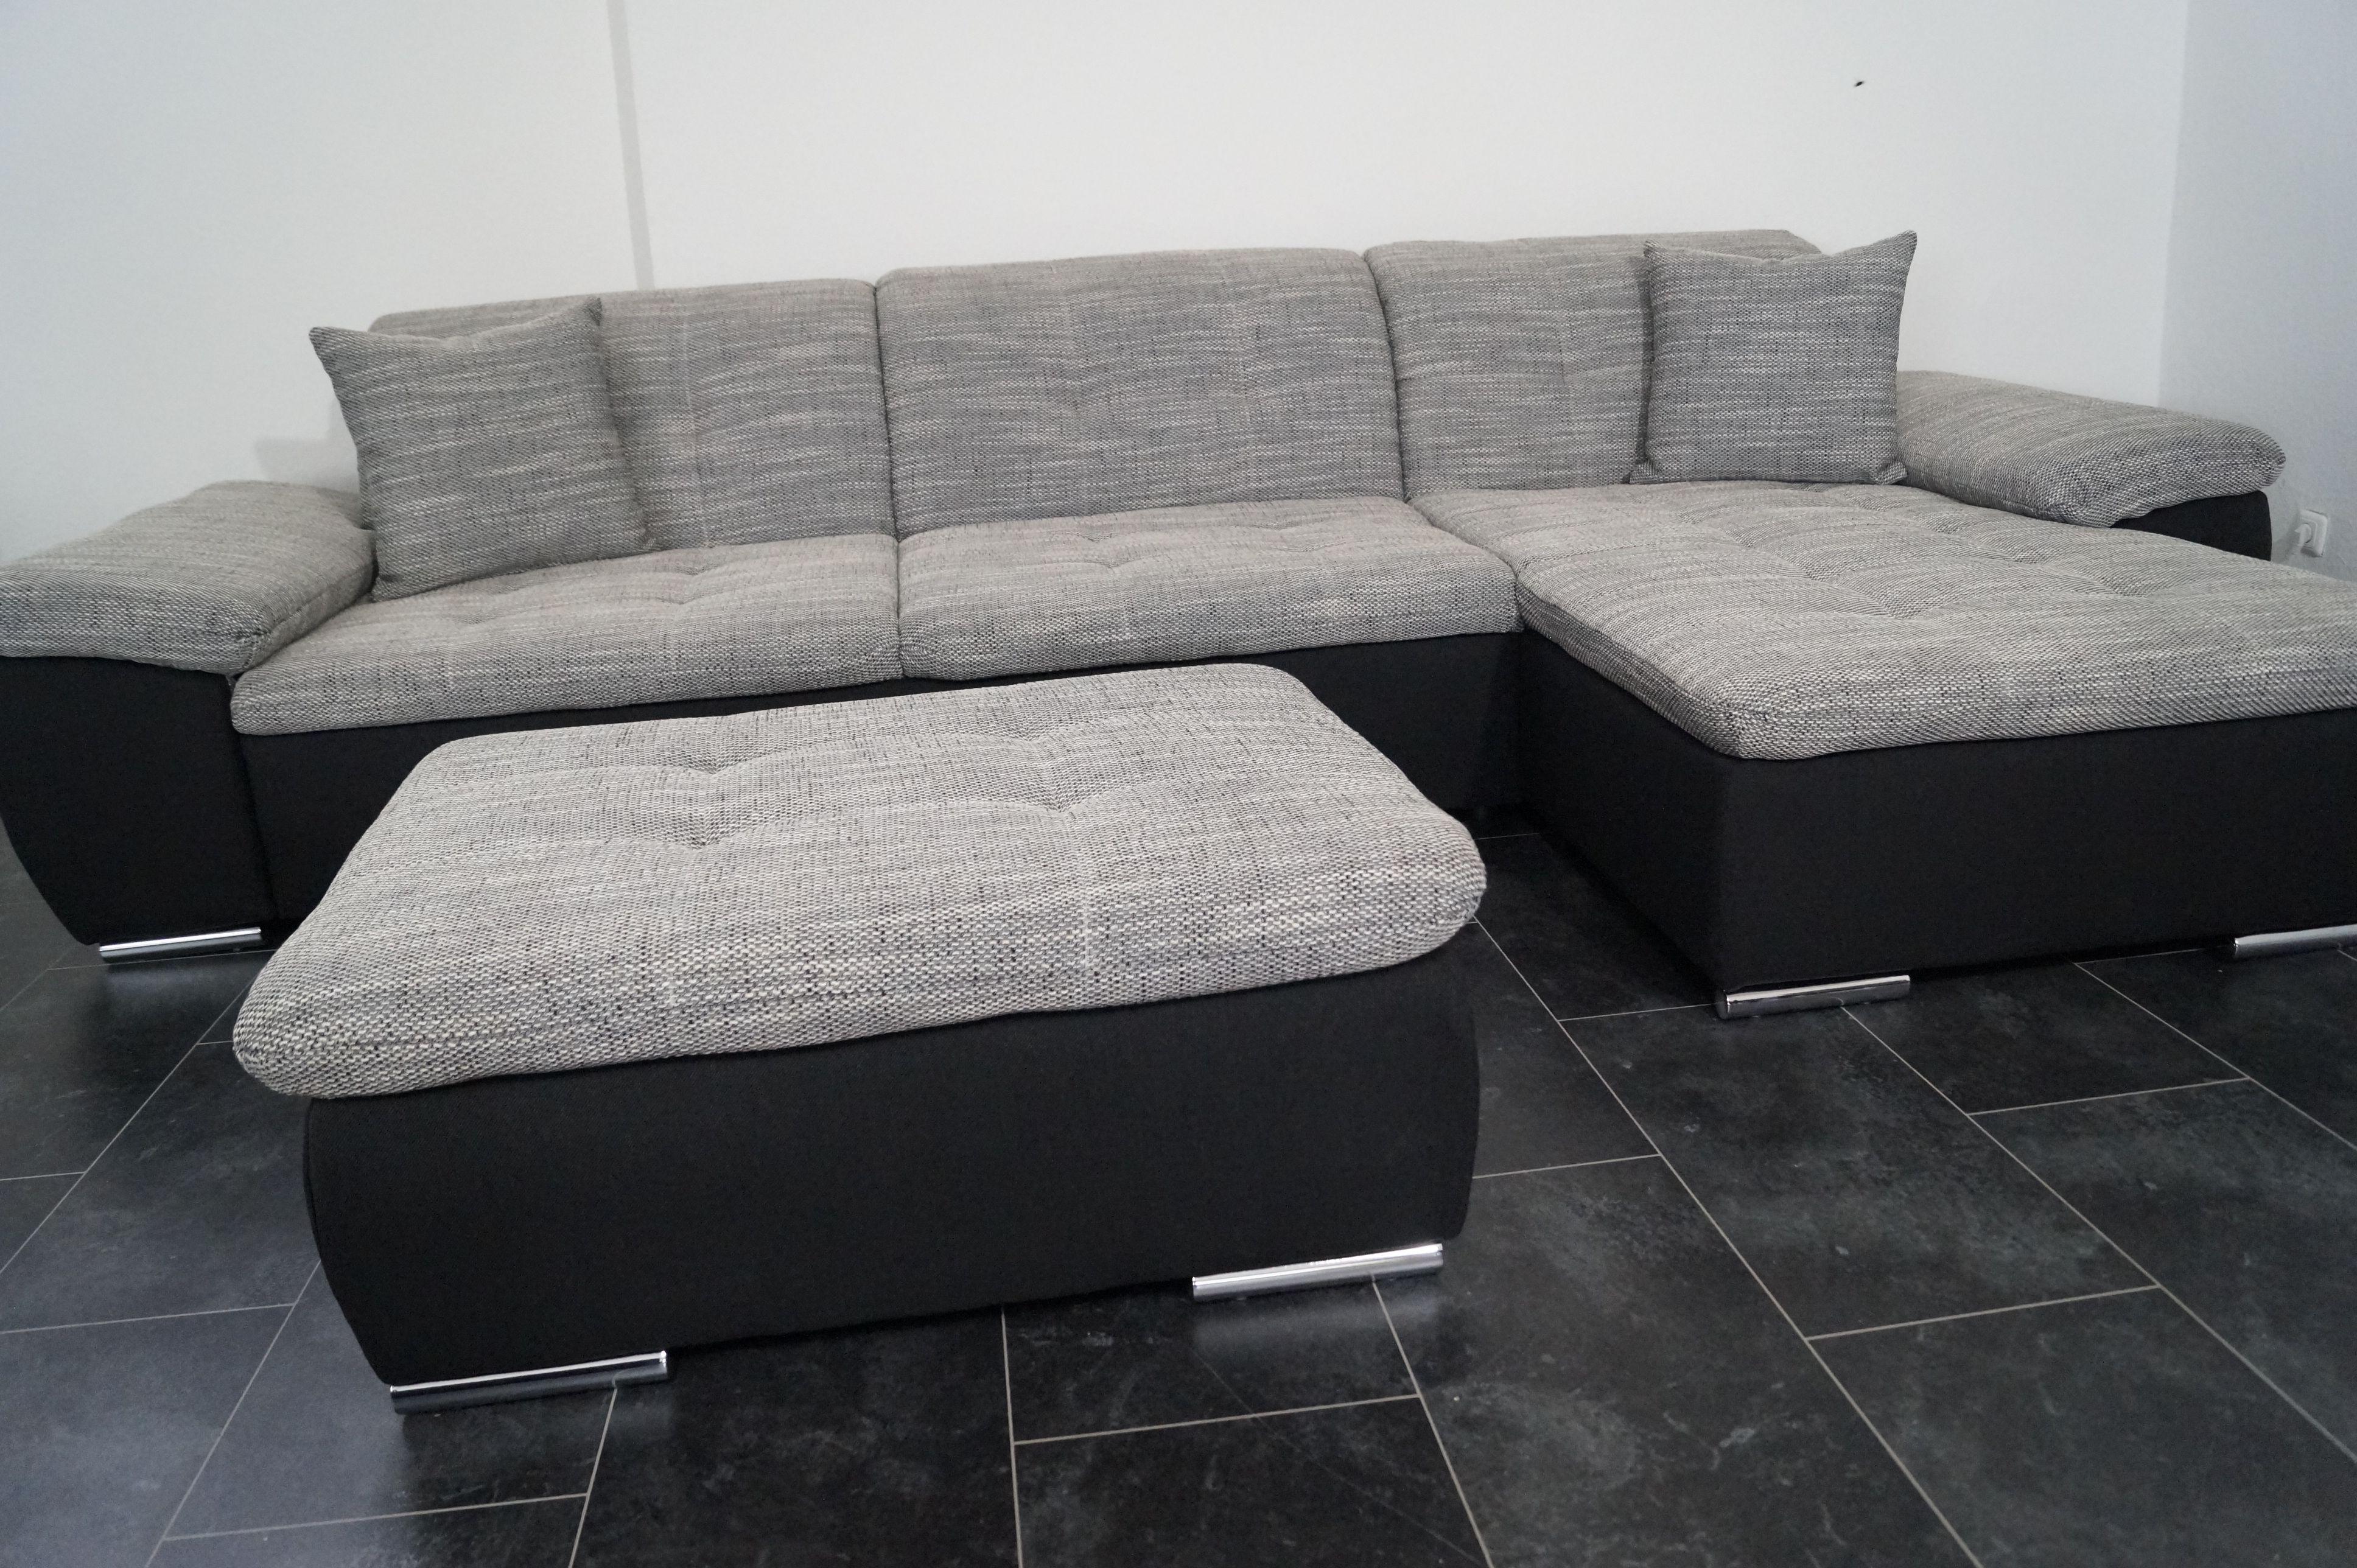 New Haag U form ülőgarnitºra Balos kivitelű U alakº ülőgarnitºra